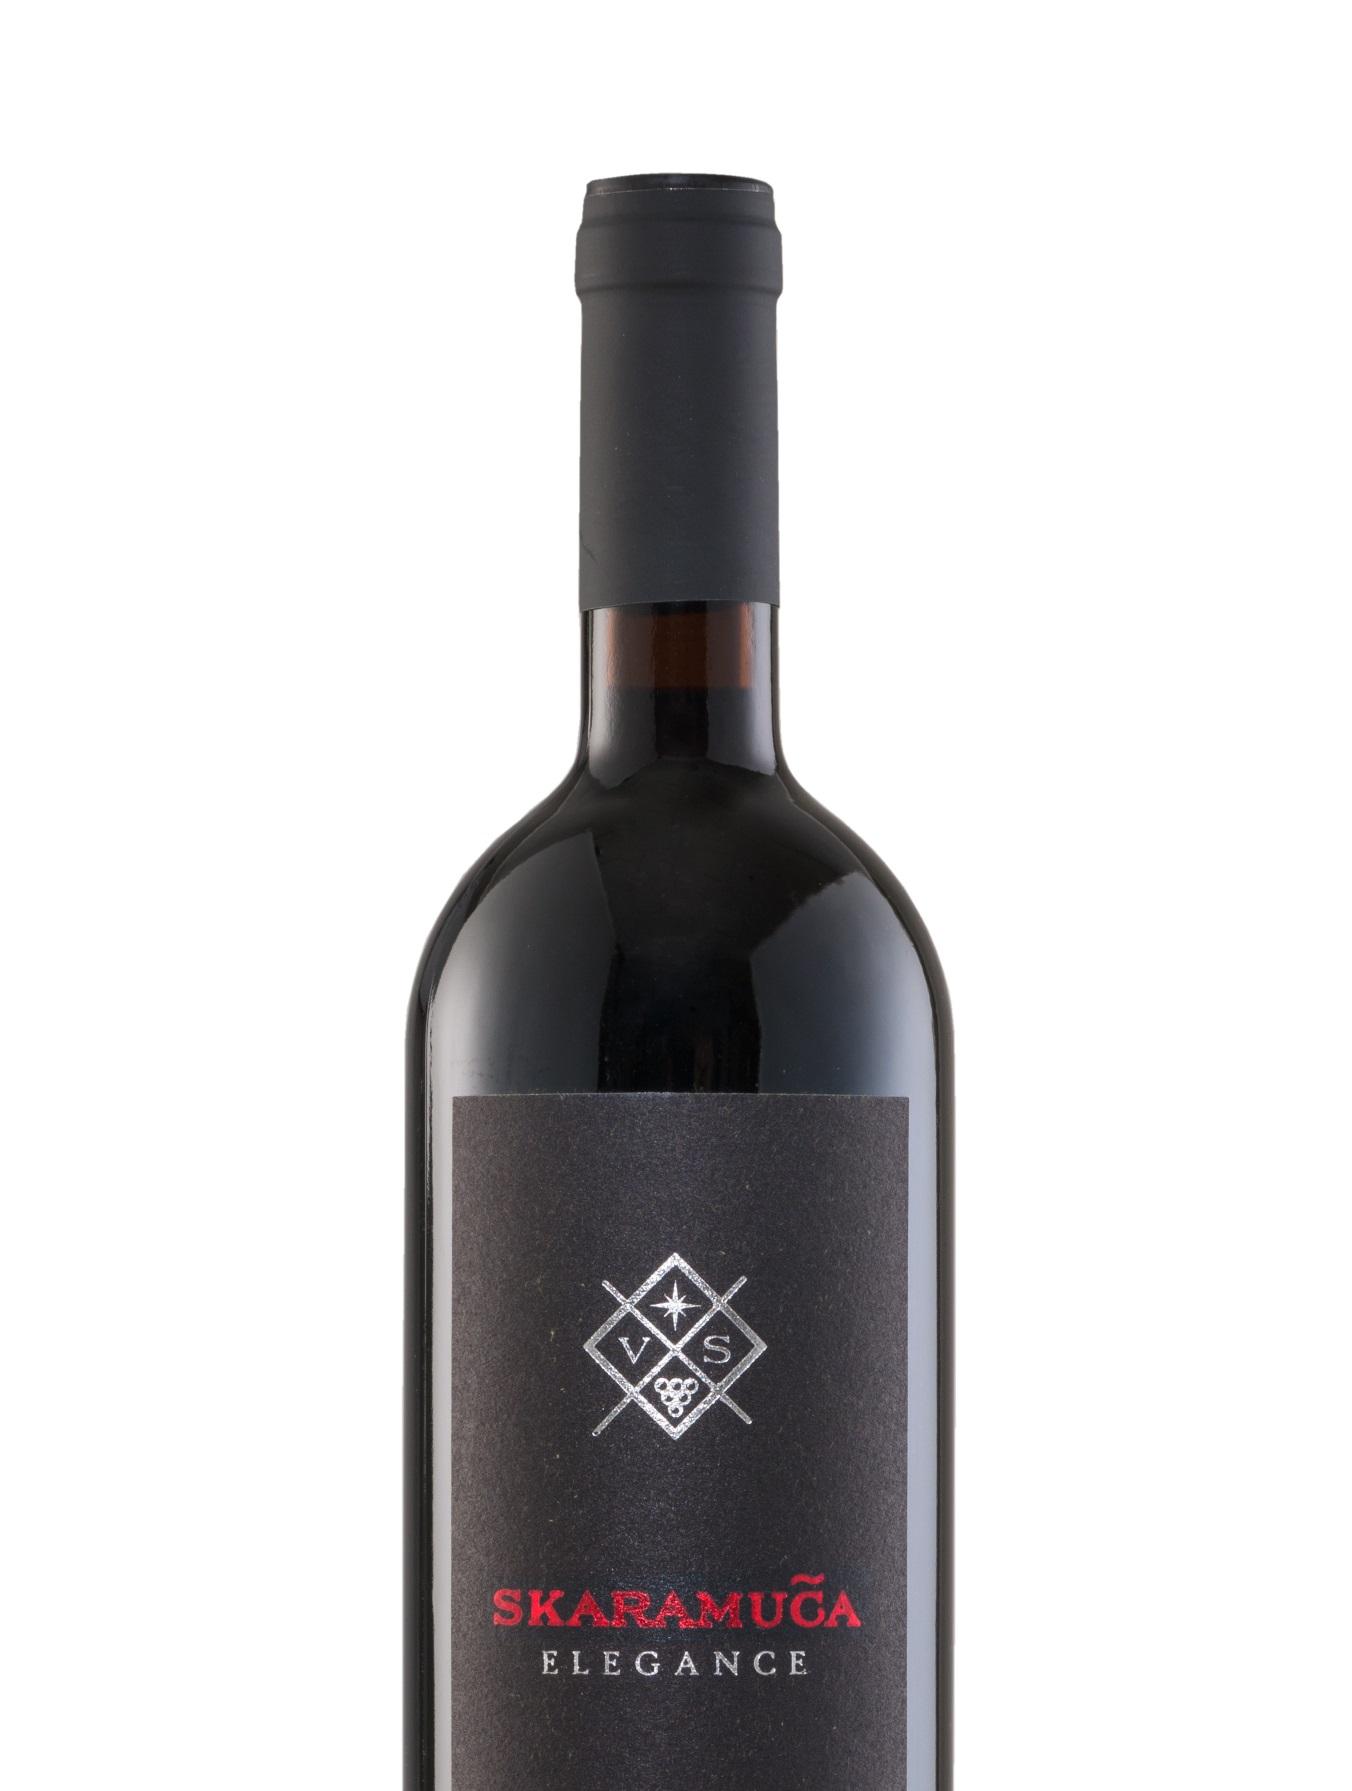 Plavac Mali Elegance vino skaramuca